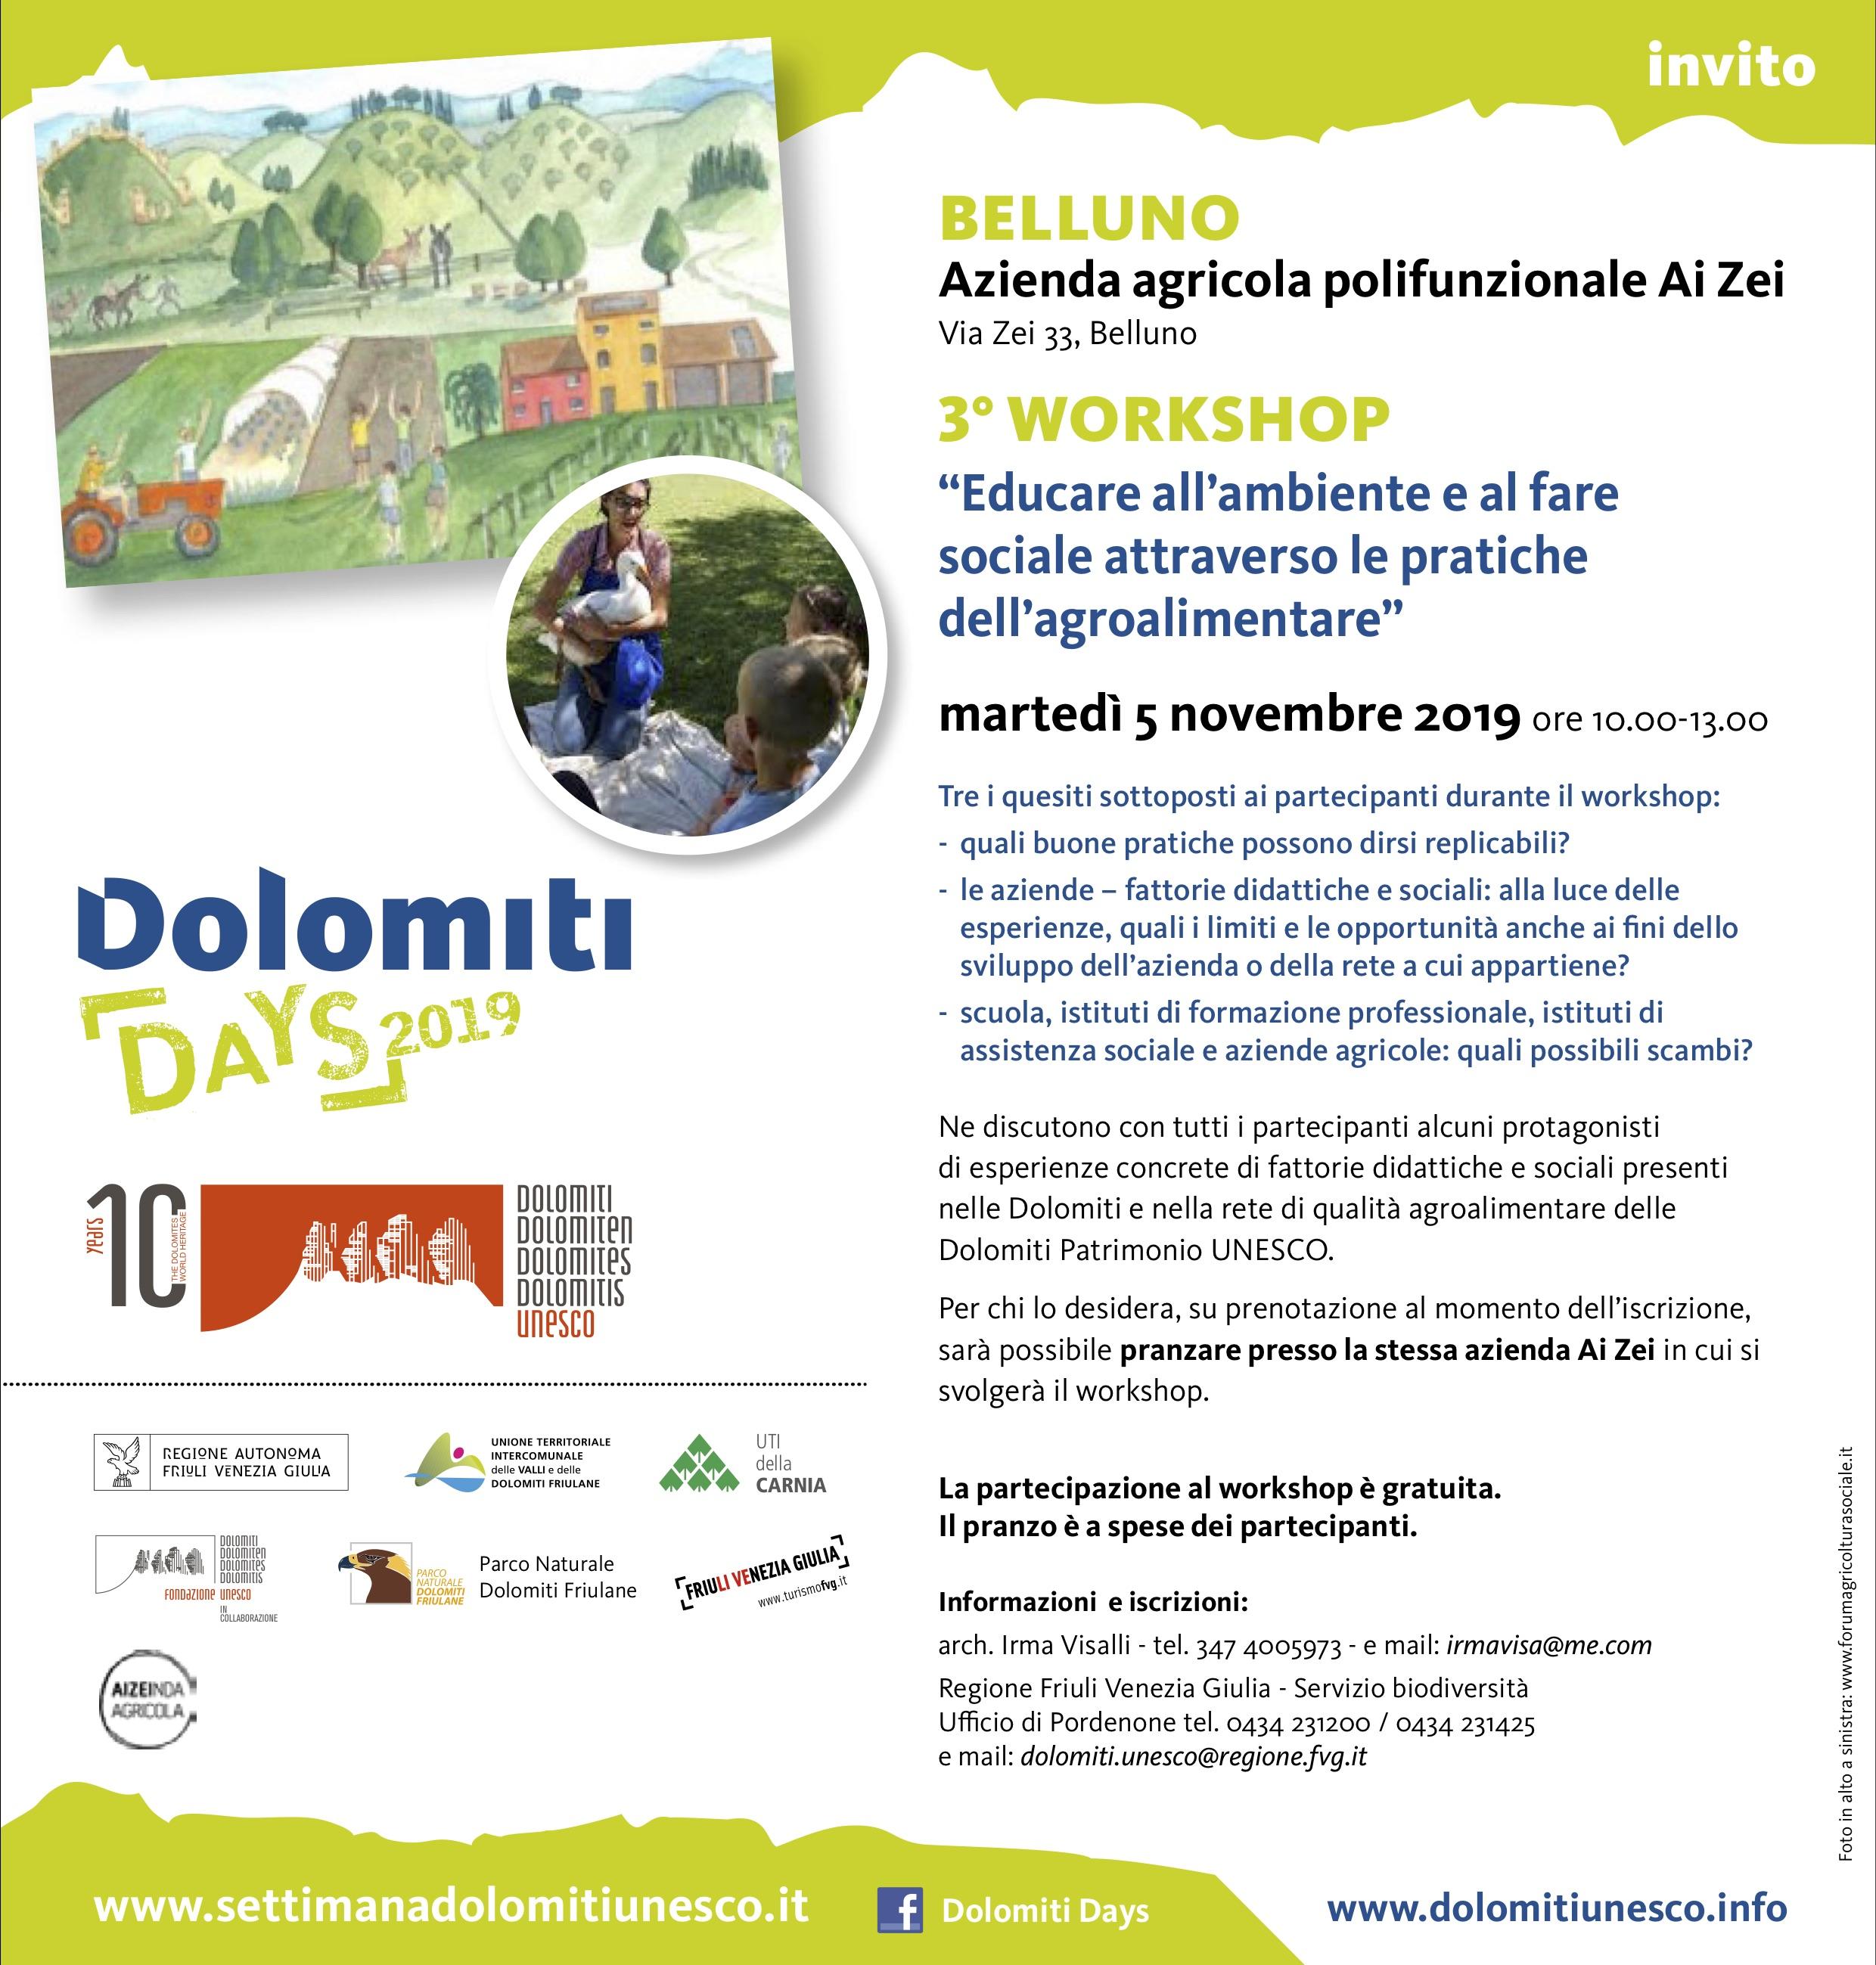 Dolomiti days 2019 workshop 5_11 Belluno